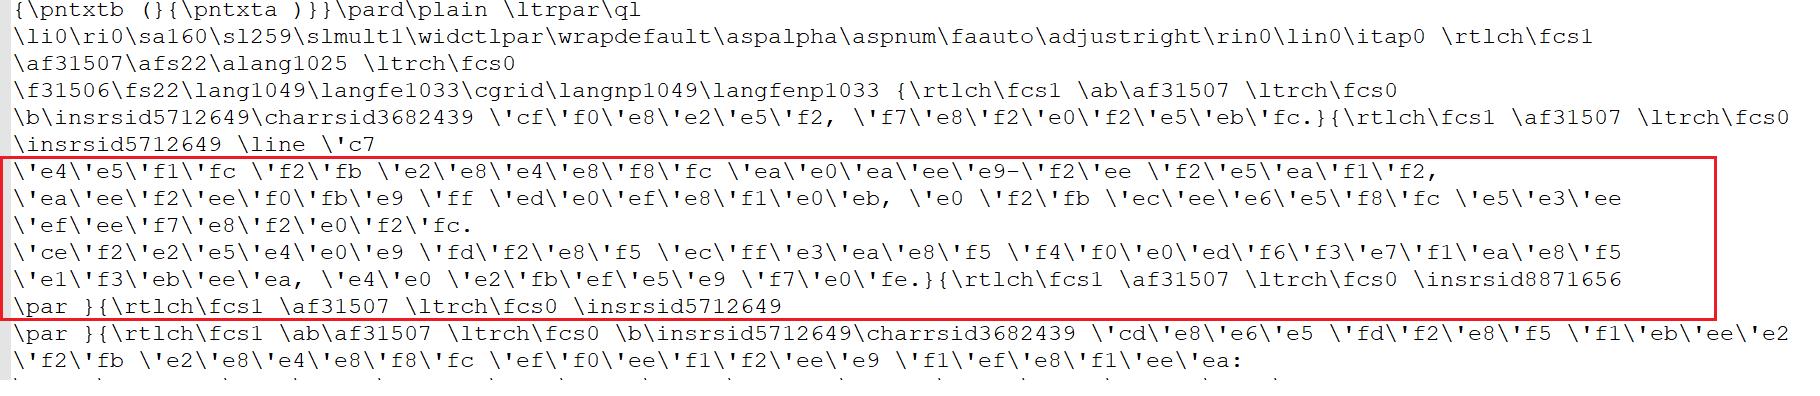 Конвертация rtf в xml на С# - 2